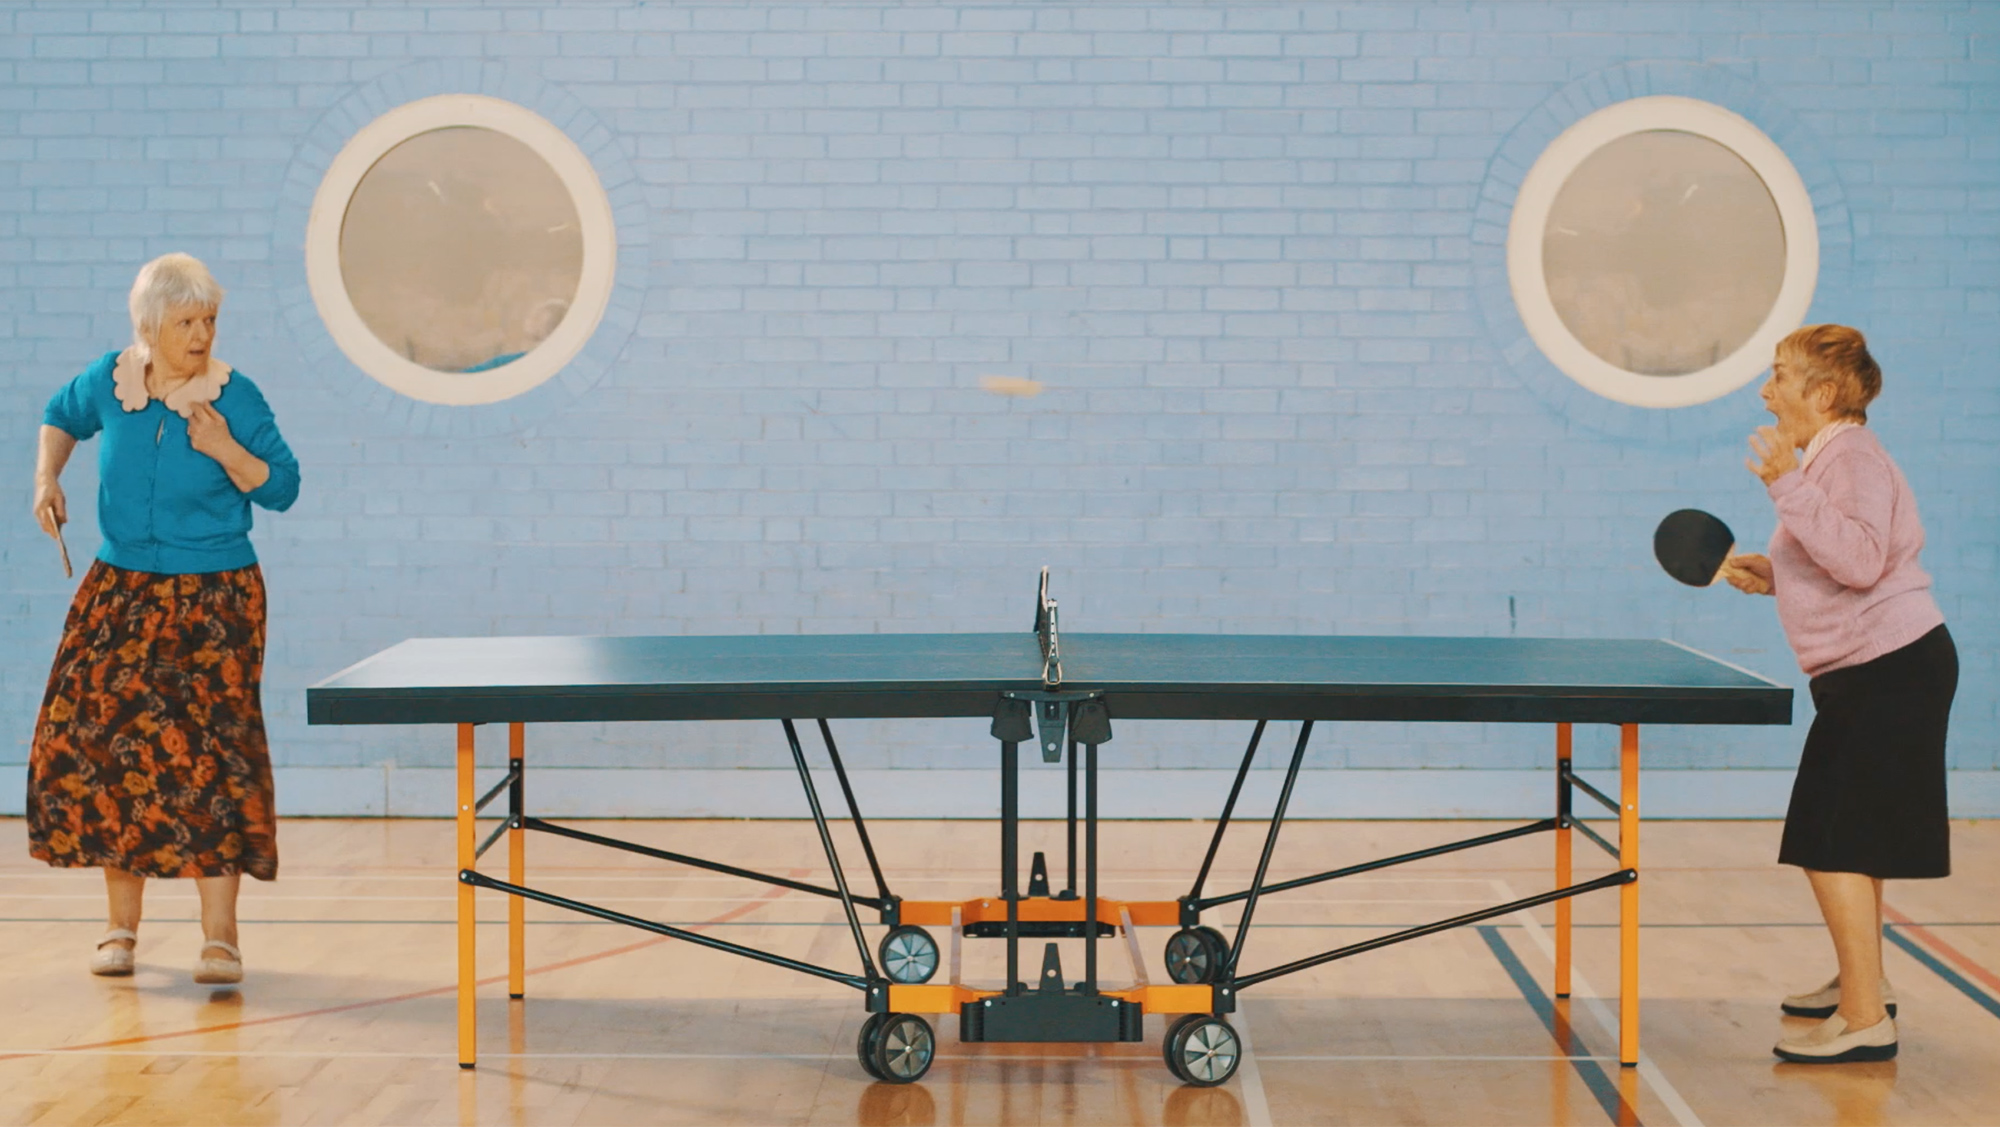 Barclays-Film-Table-Tennis.jpg